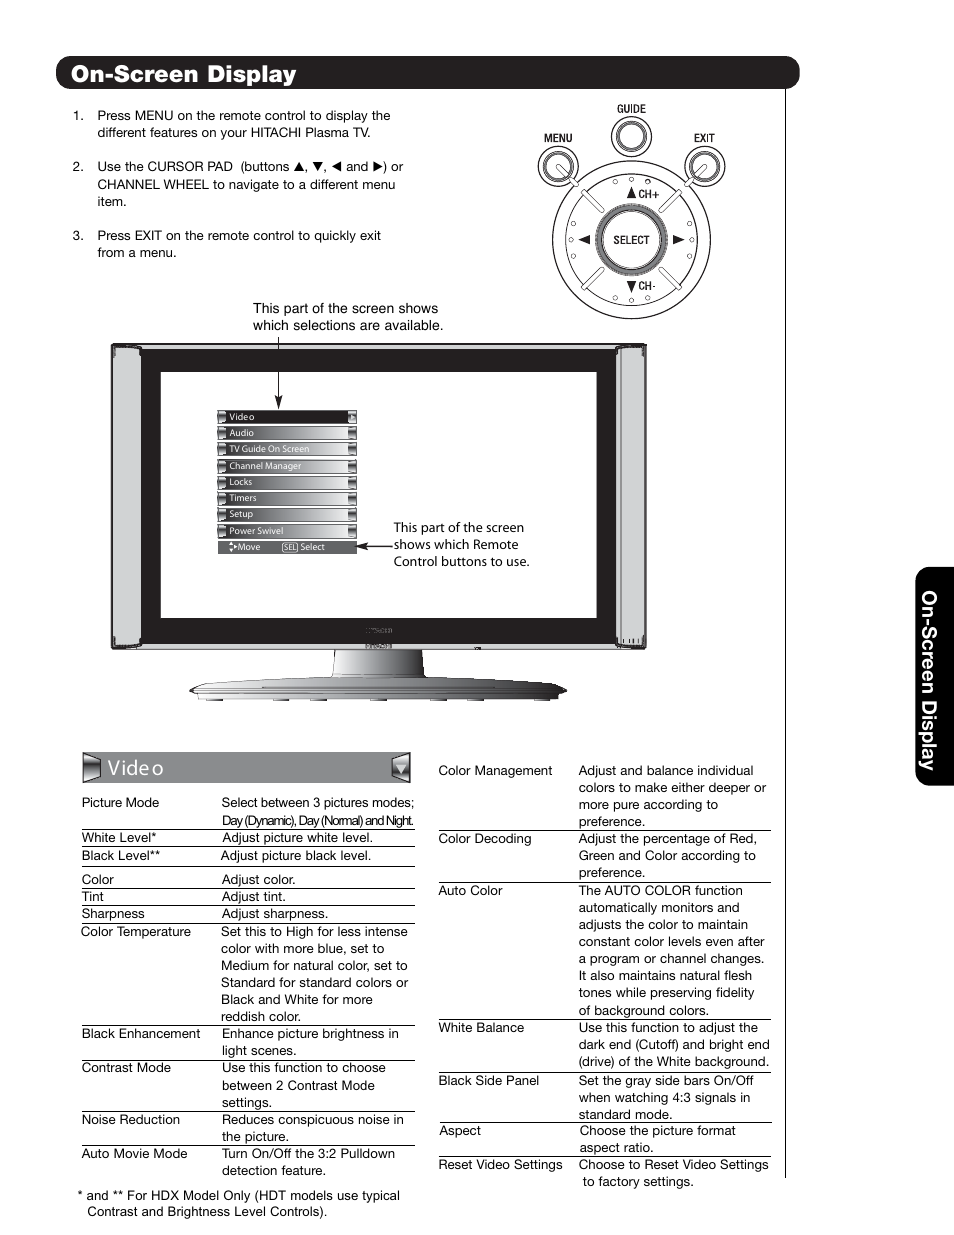 on screen display vide o on scr een display hitachi 55hdt79 user rh manualsdir com Hitachi 55HDS69 Stand Hitachi 42HDS69 Remote